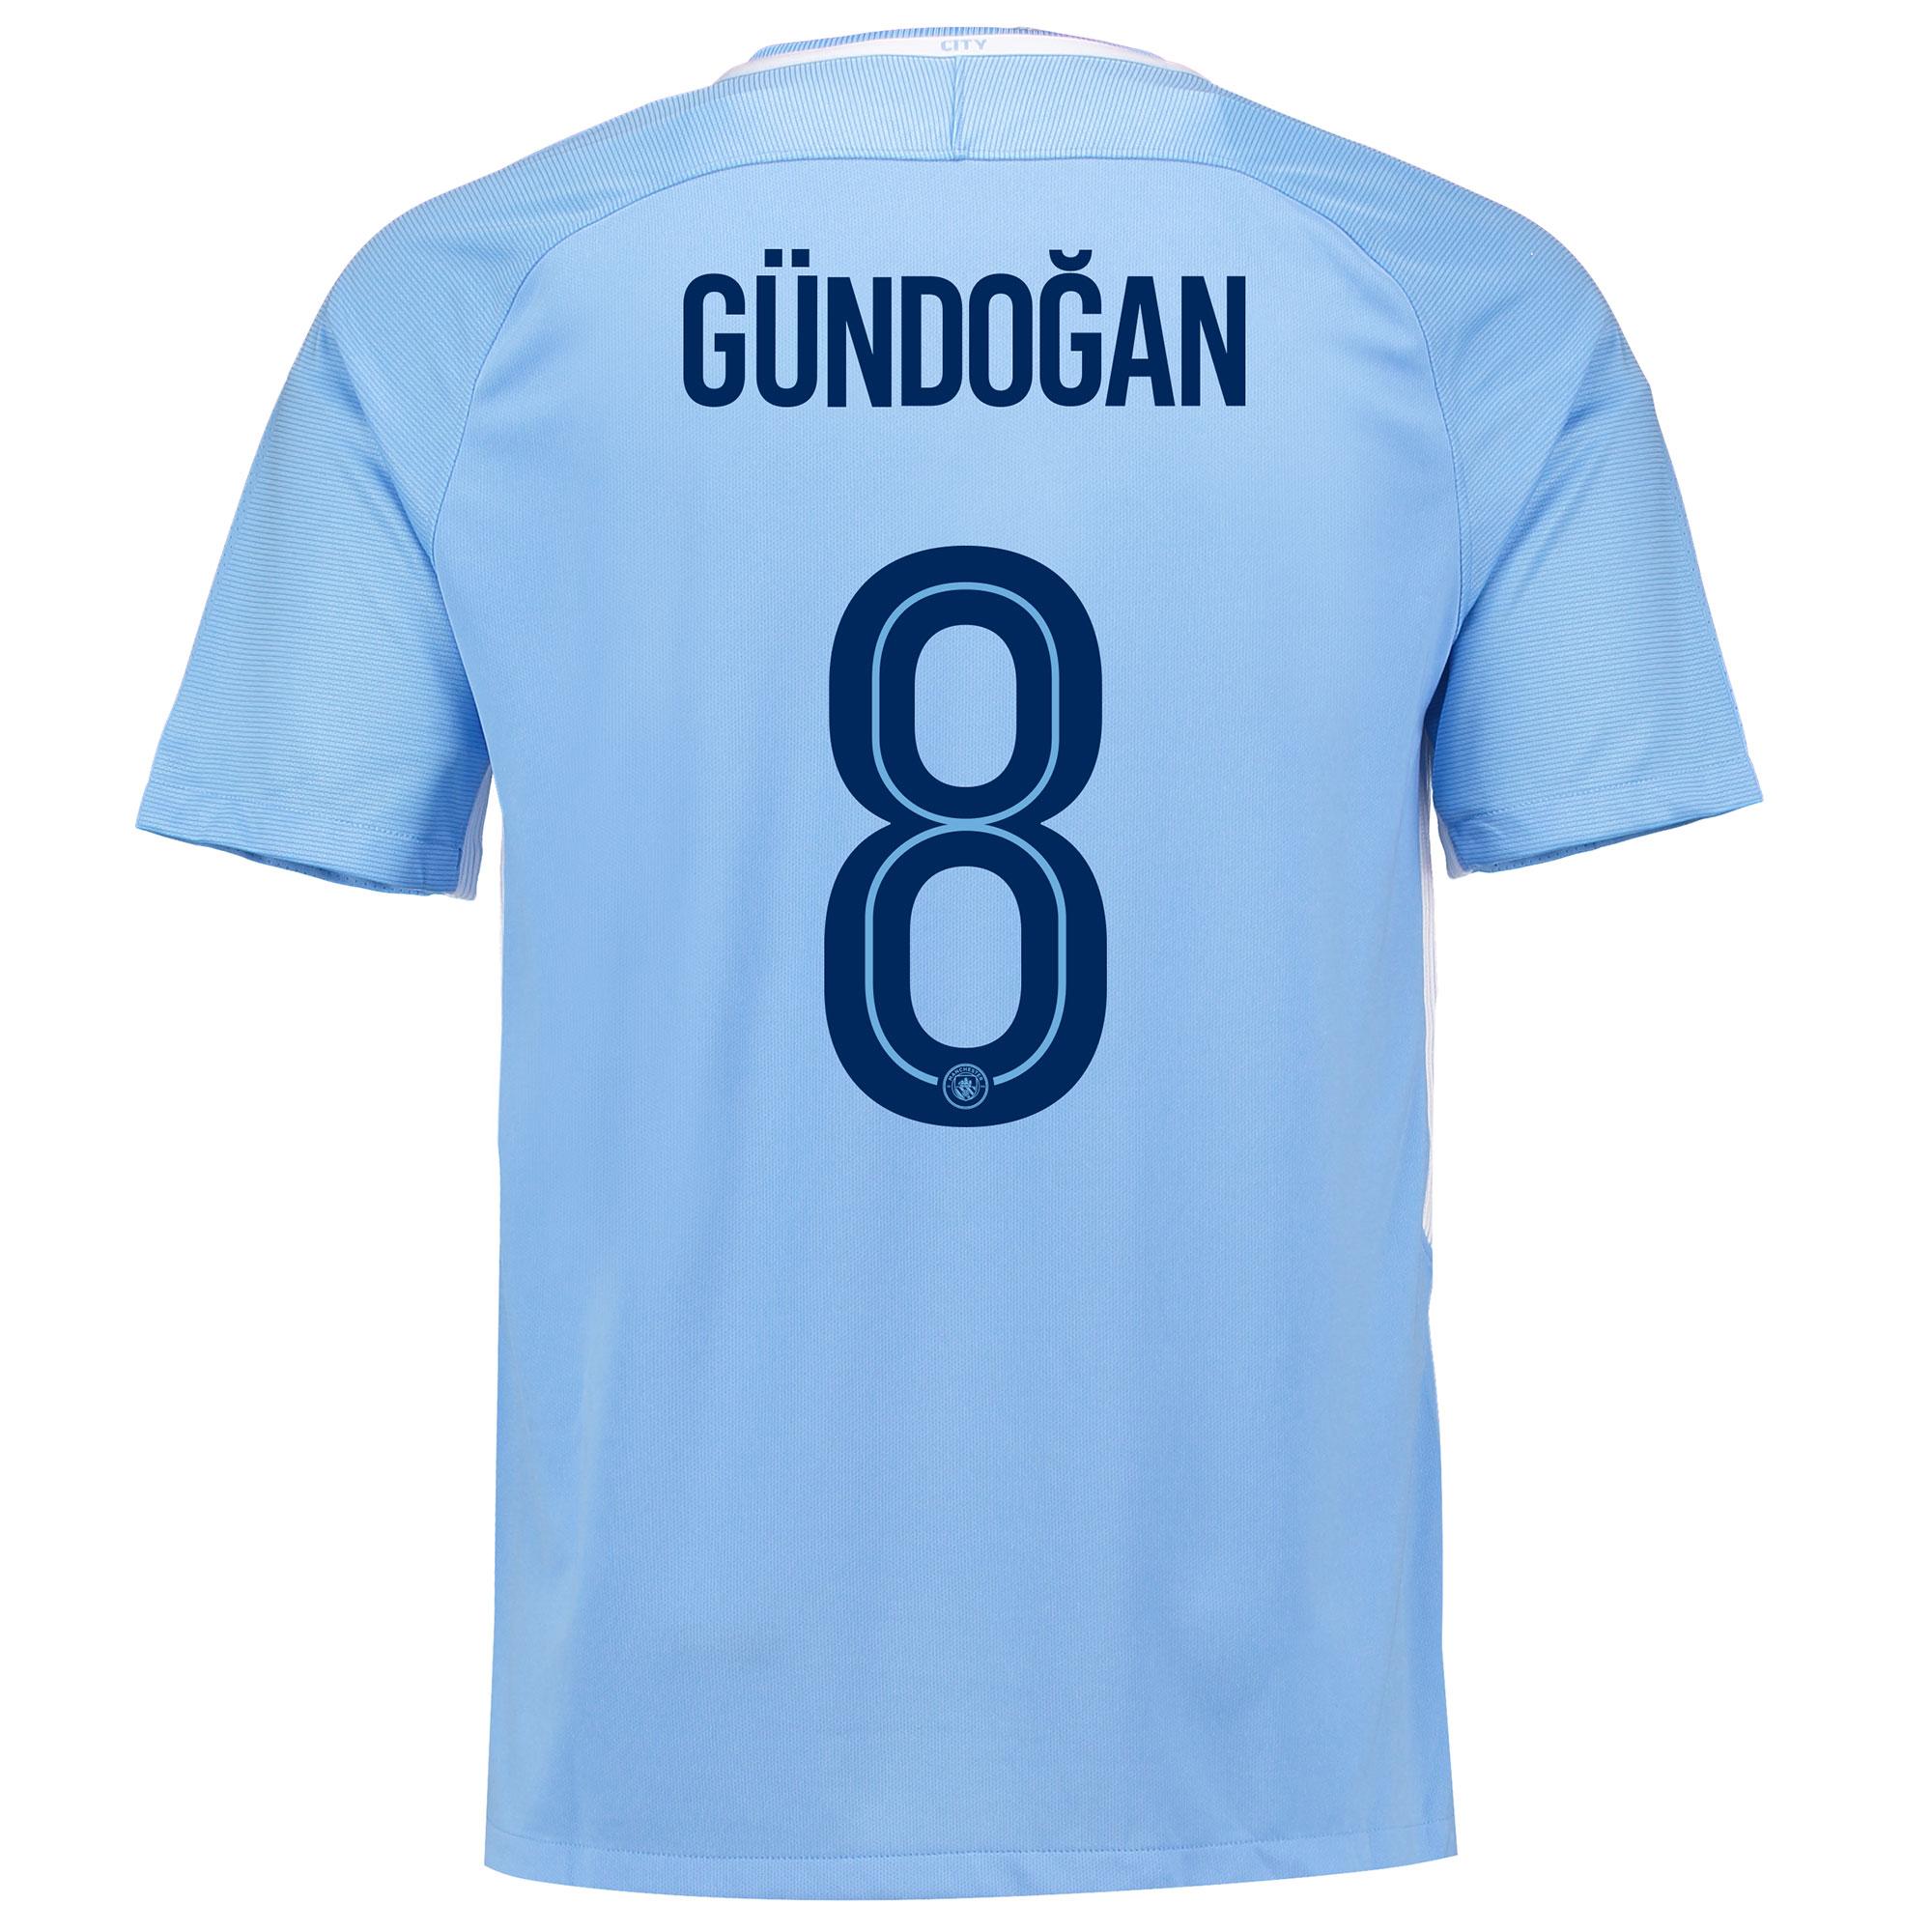 Manchester City Home Stadium Cup Shirt 2017-18 with Gündogan 8 printin